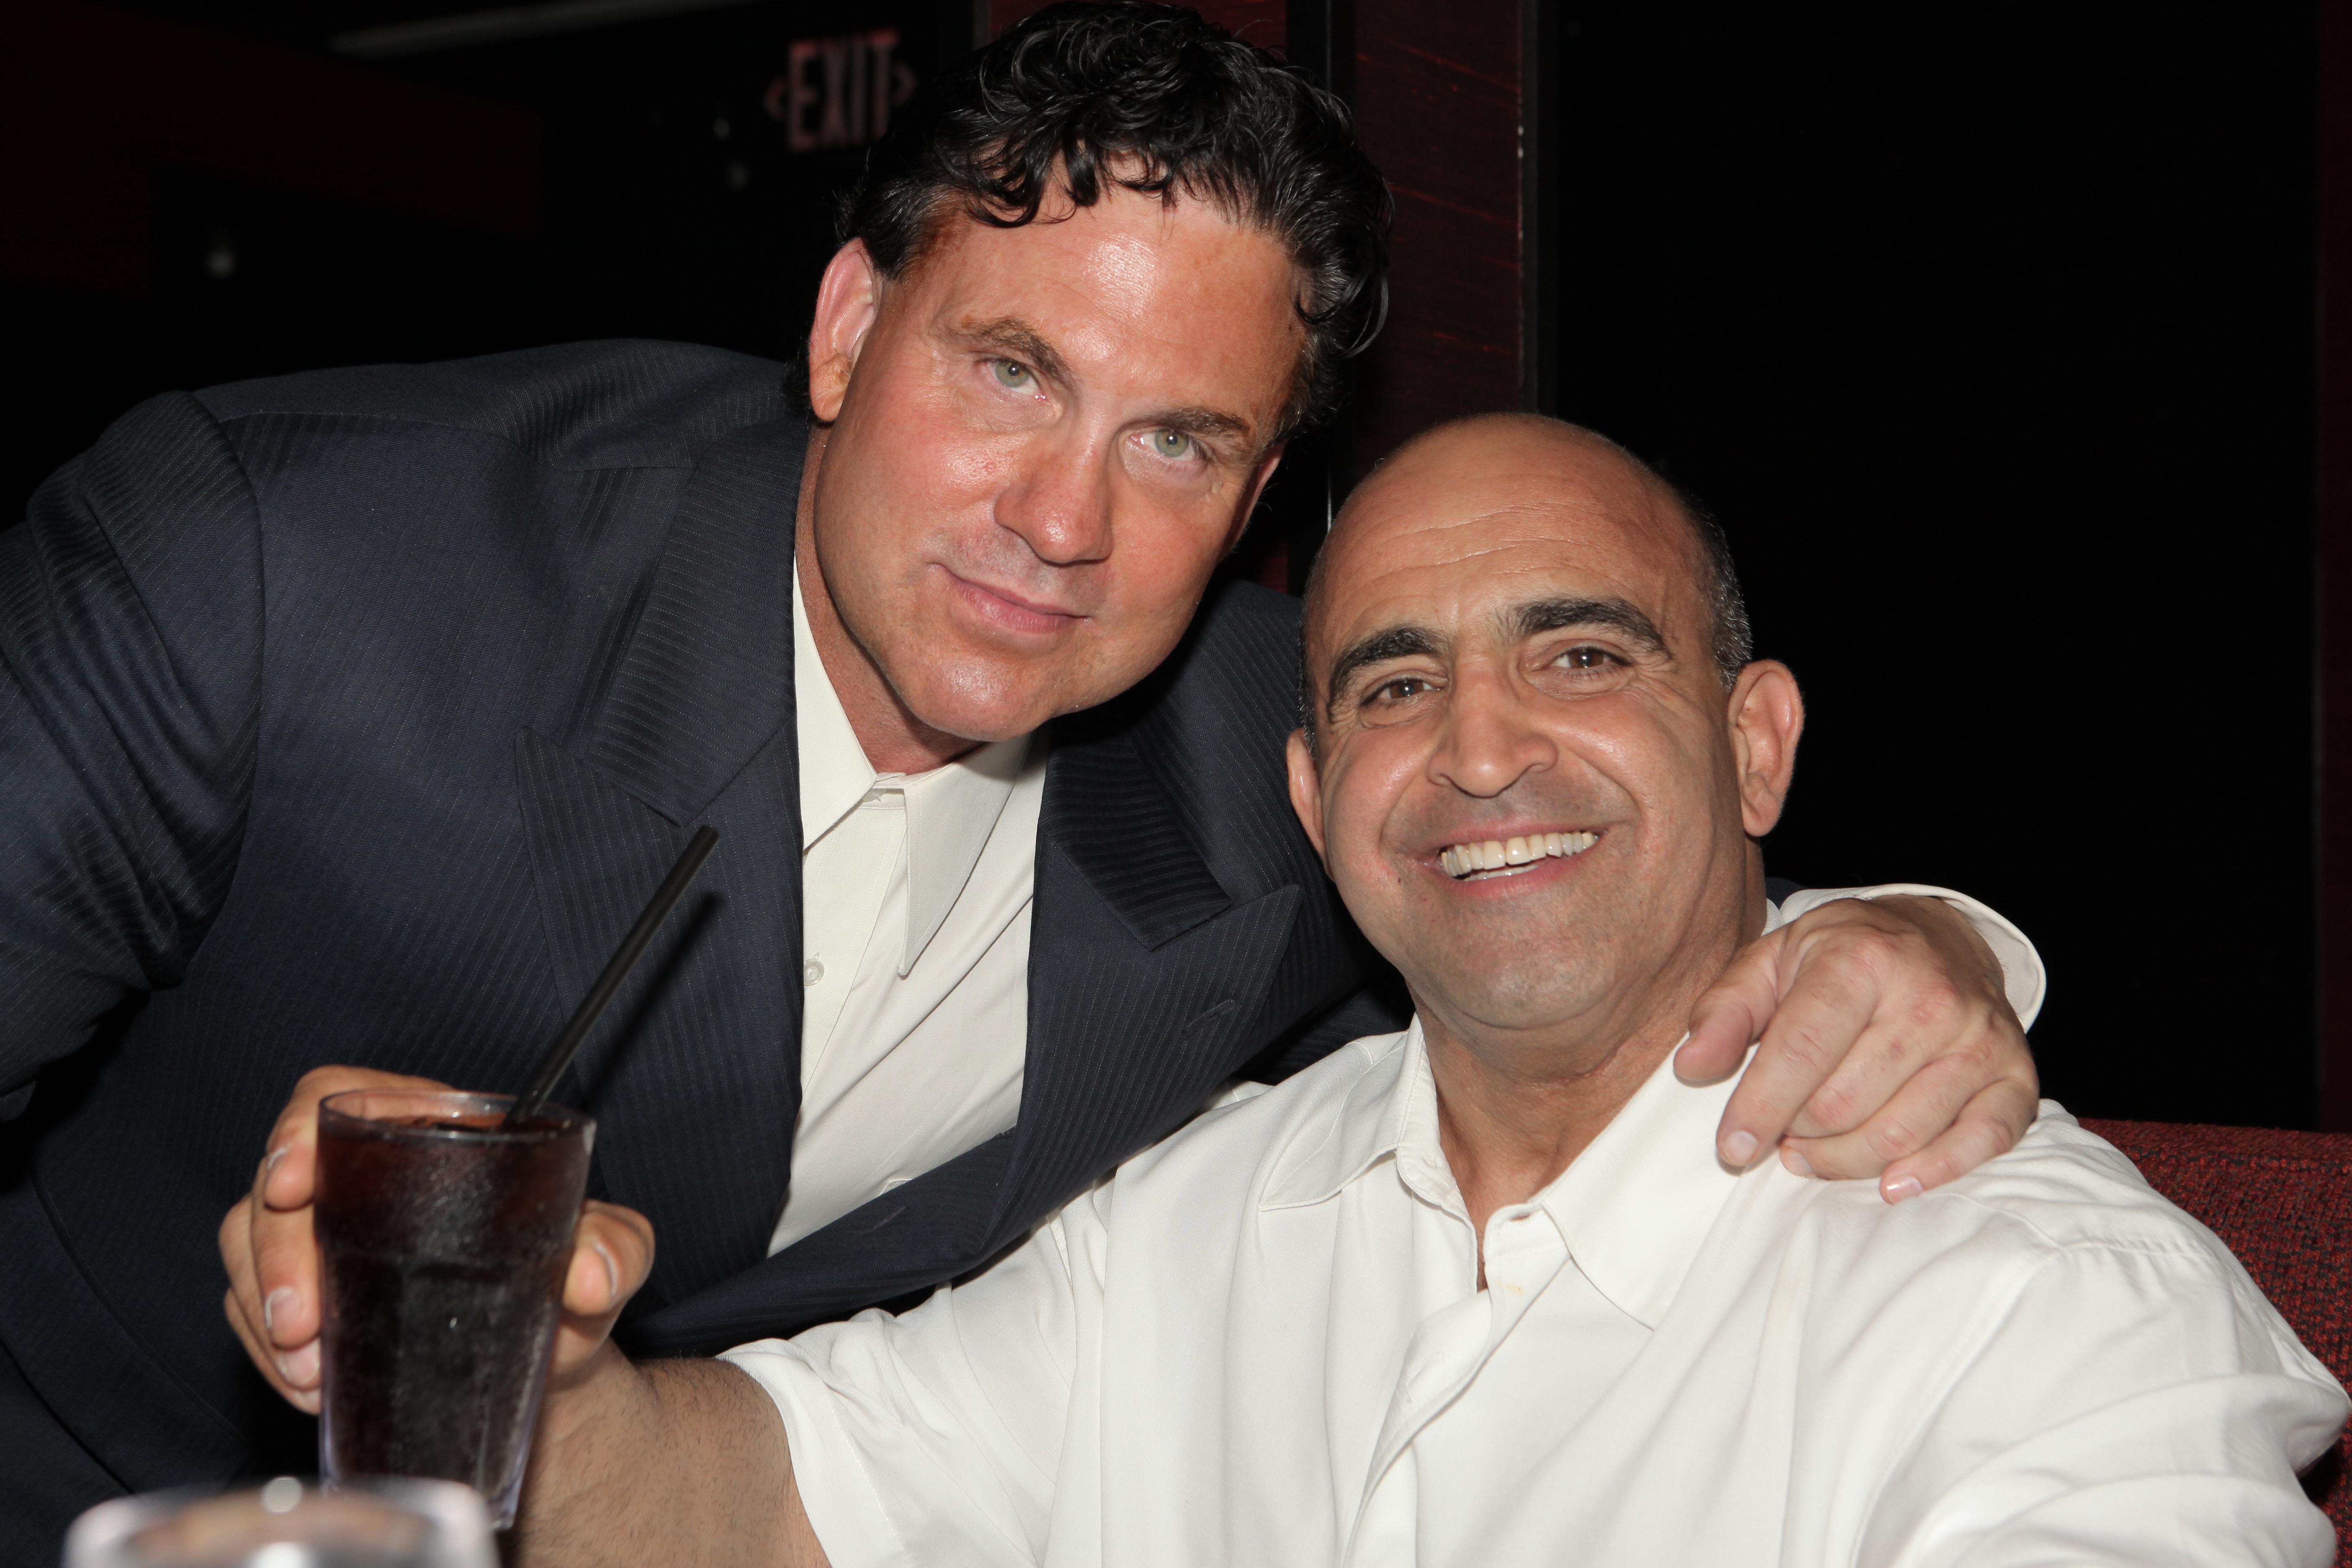 Joe Antouri with Dr. Marco Juliano